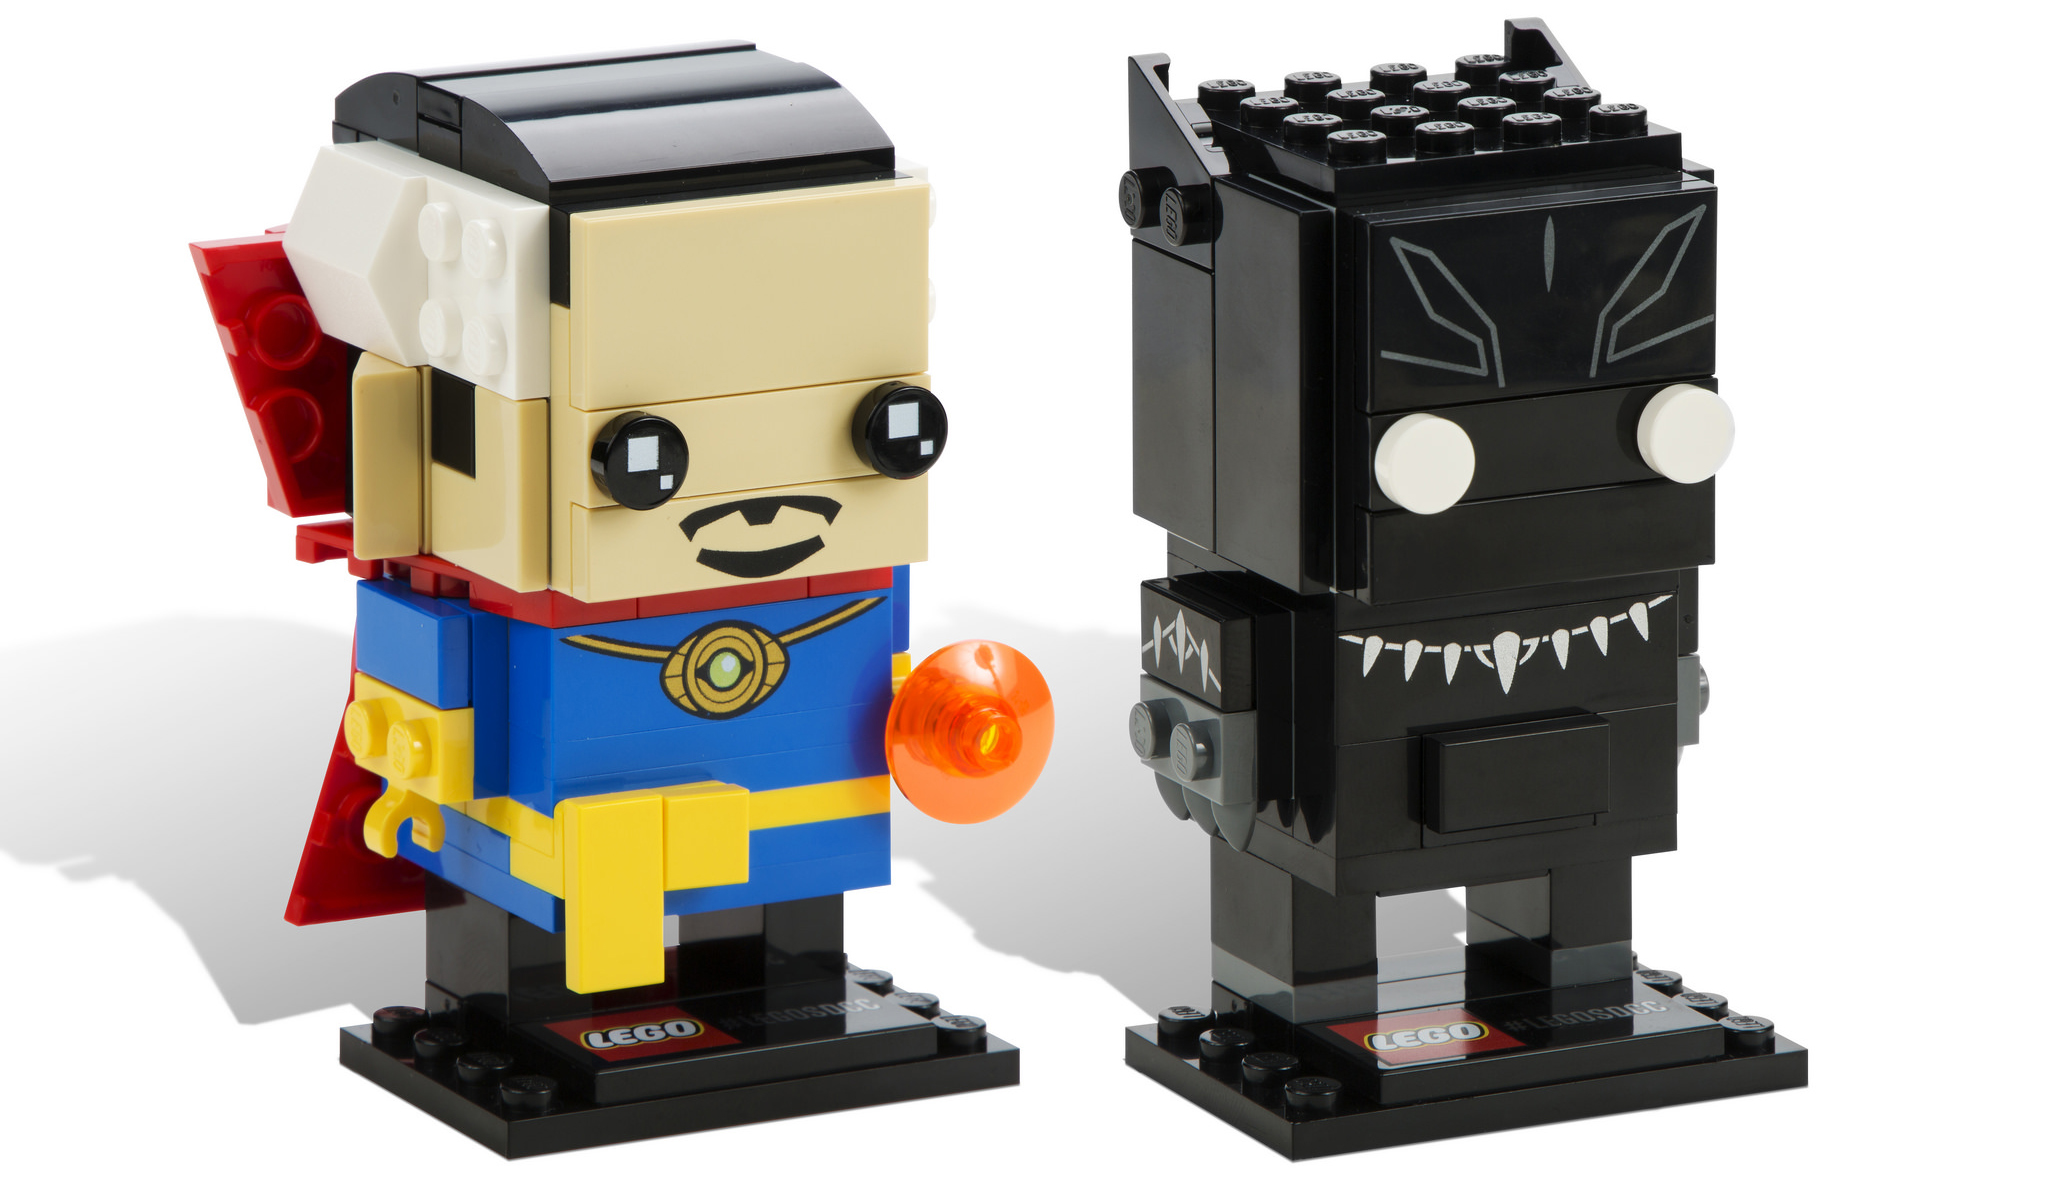 lego-super-heroes-brickheadz-2